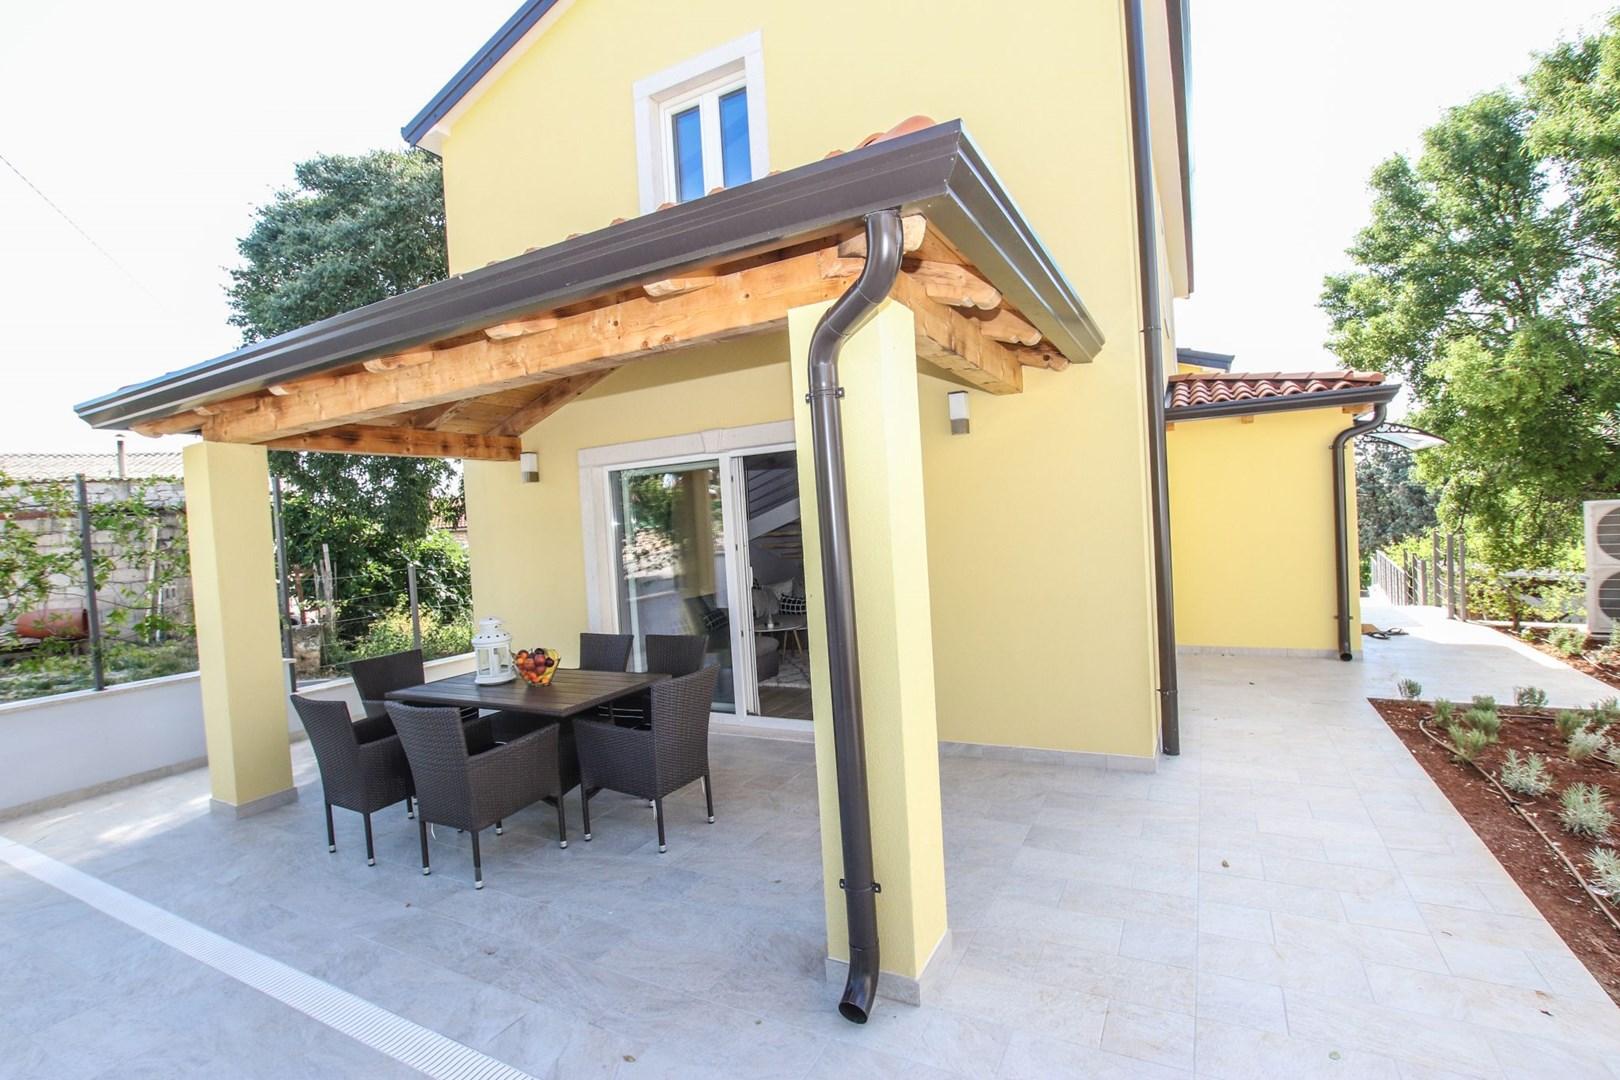 Ferienhaus Villa Albina mit privatem Pool in der Nähe von Aquacolors (2240246), Mugeba, , Istrien, Kroatien, Bild 8